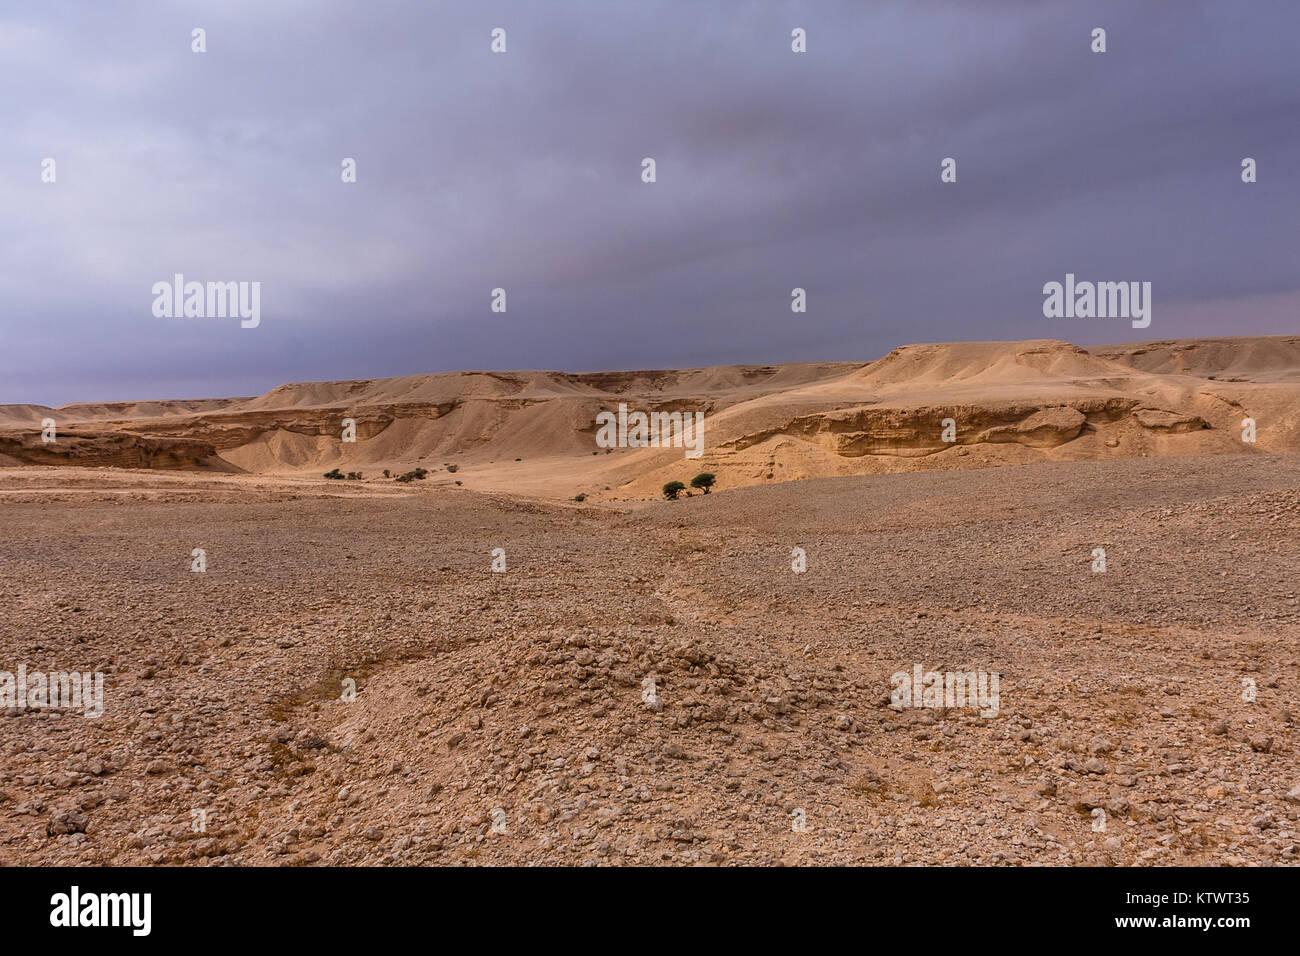 A desert landscape east of Riyadh - Stock Image